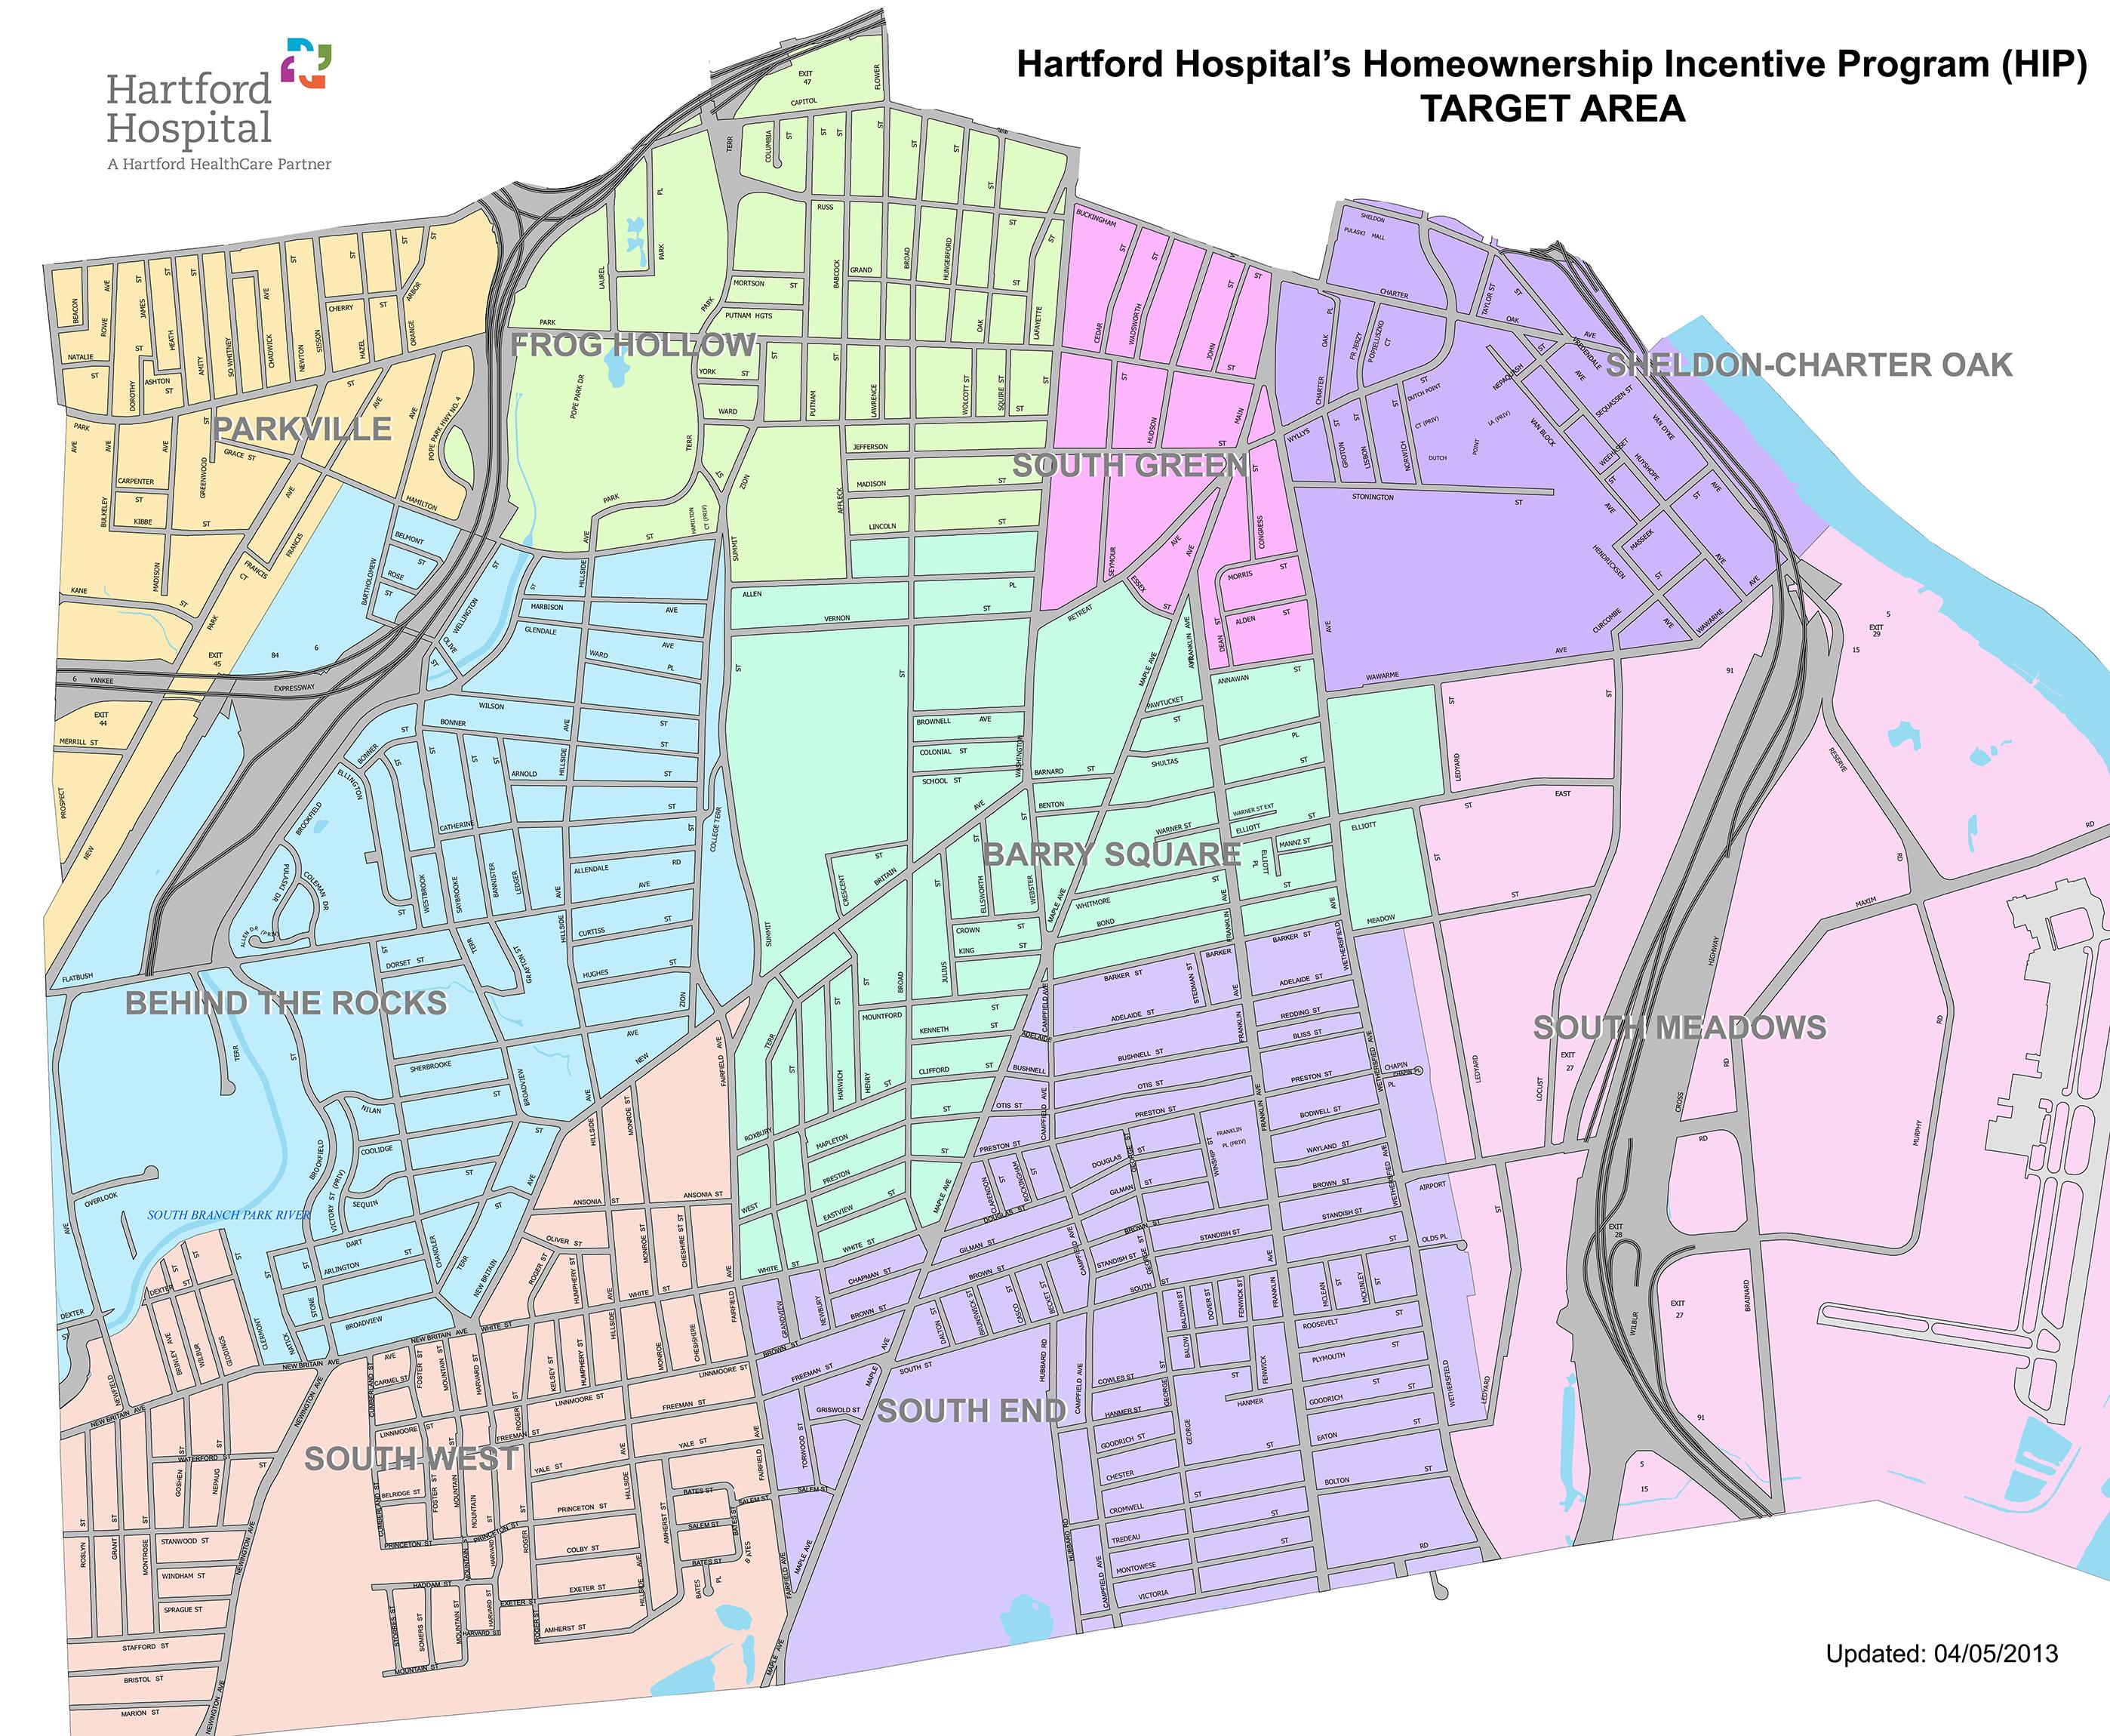 Hartford Hospital Campus Map.Homeownership Incentive Program Hip Sina